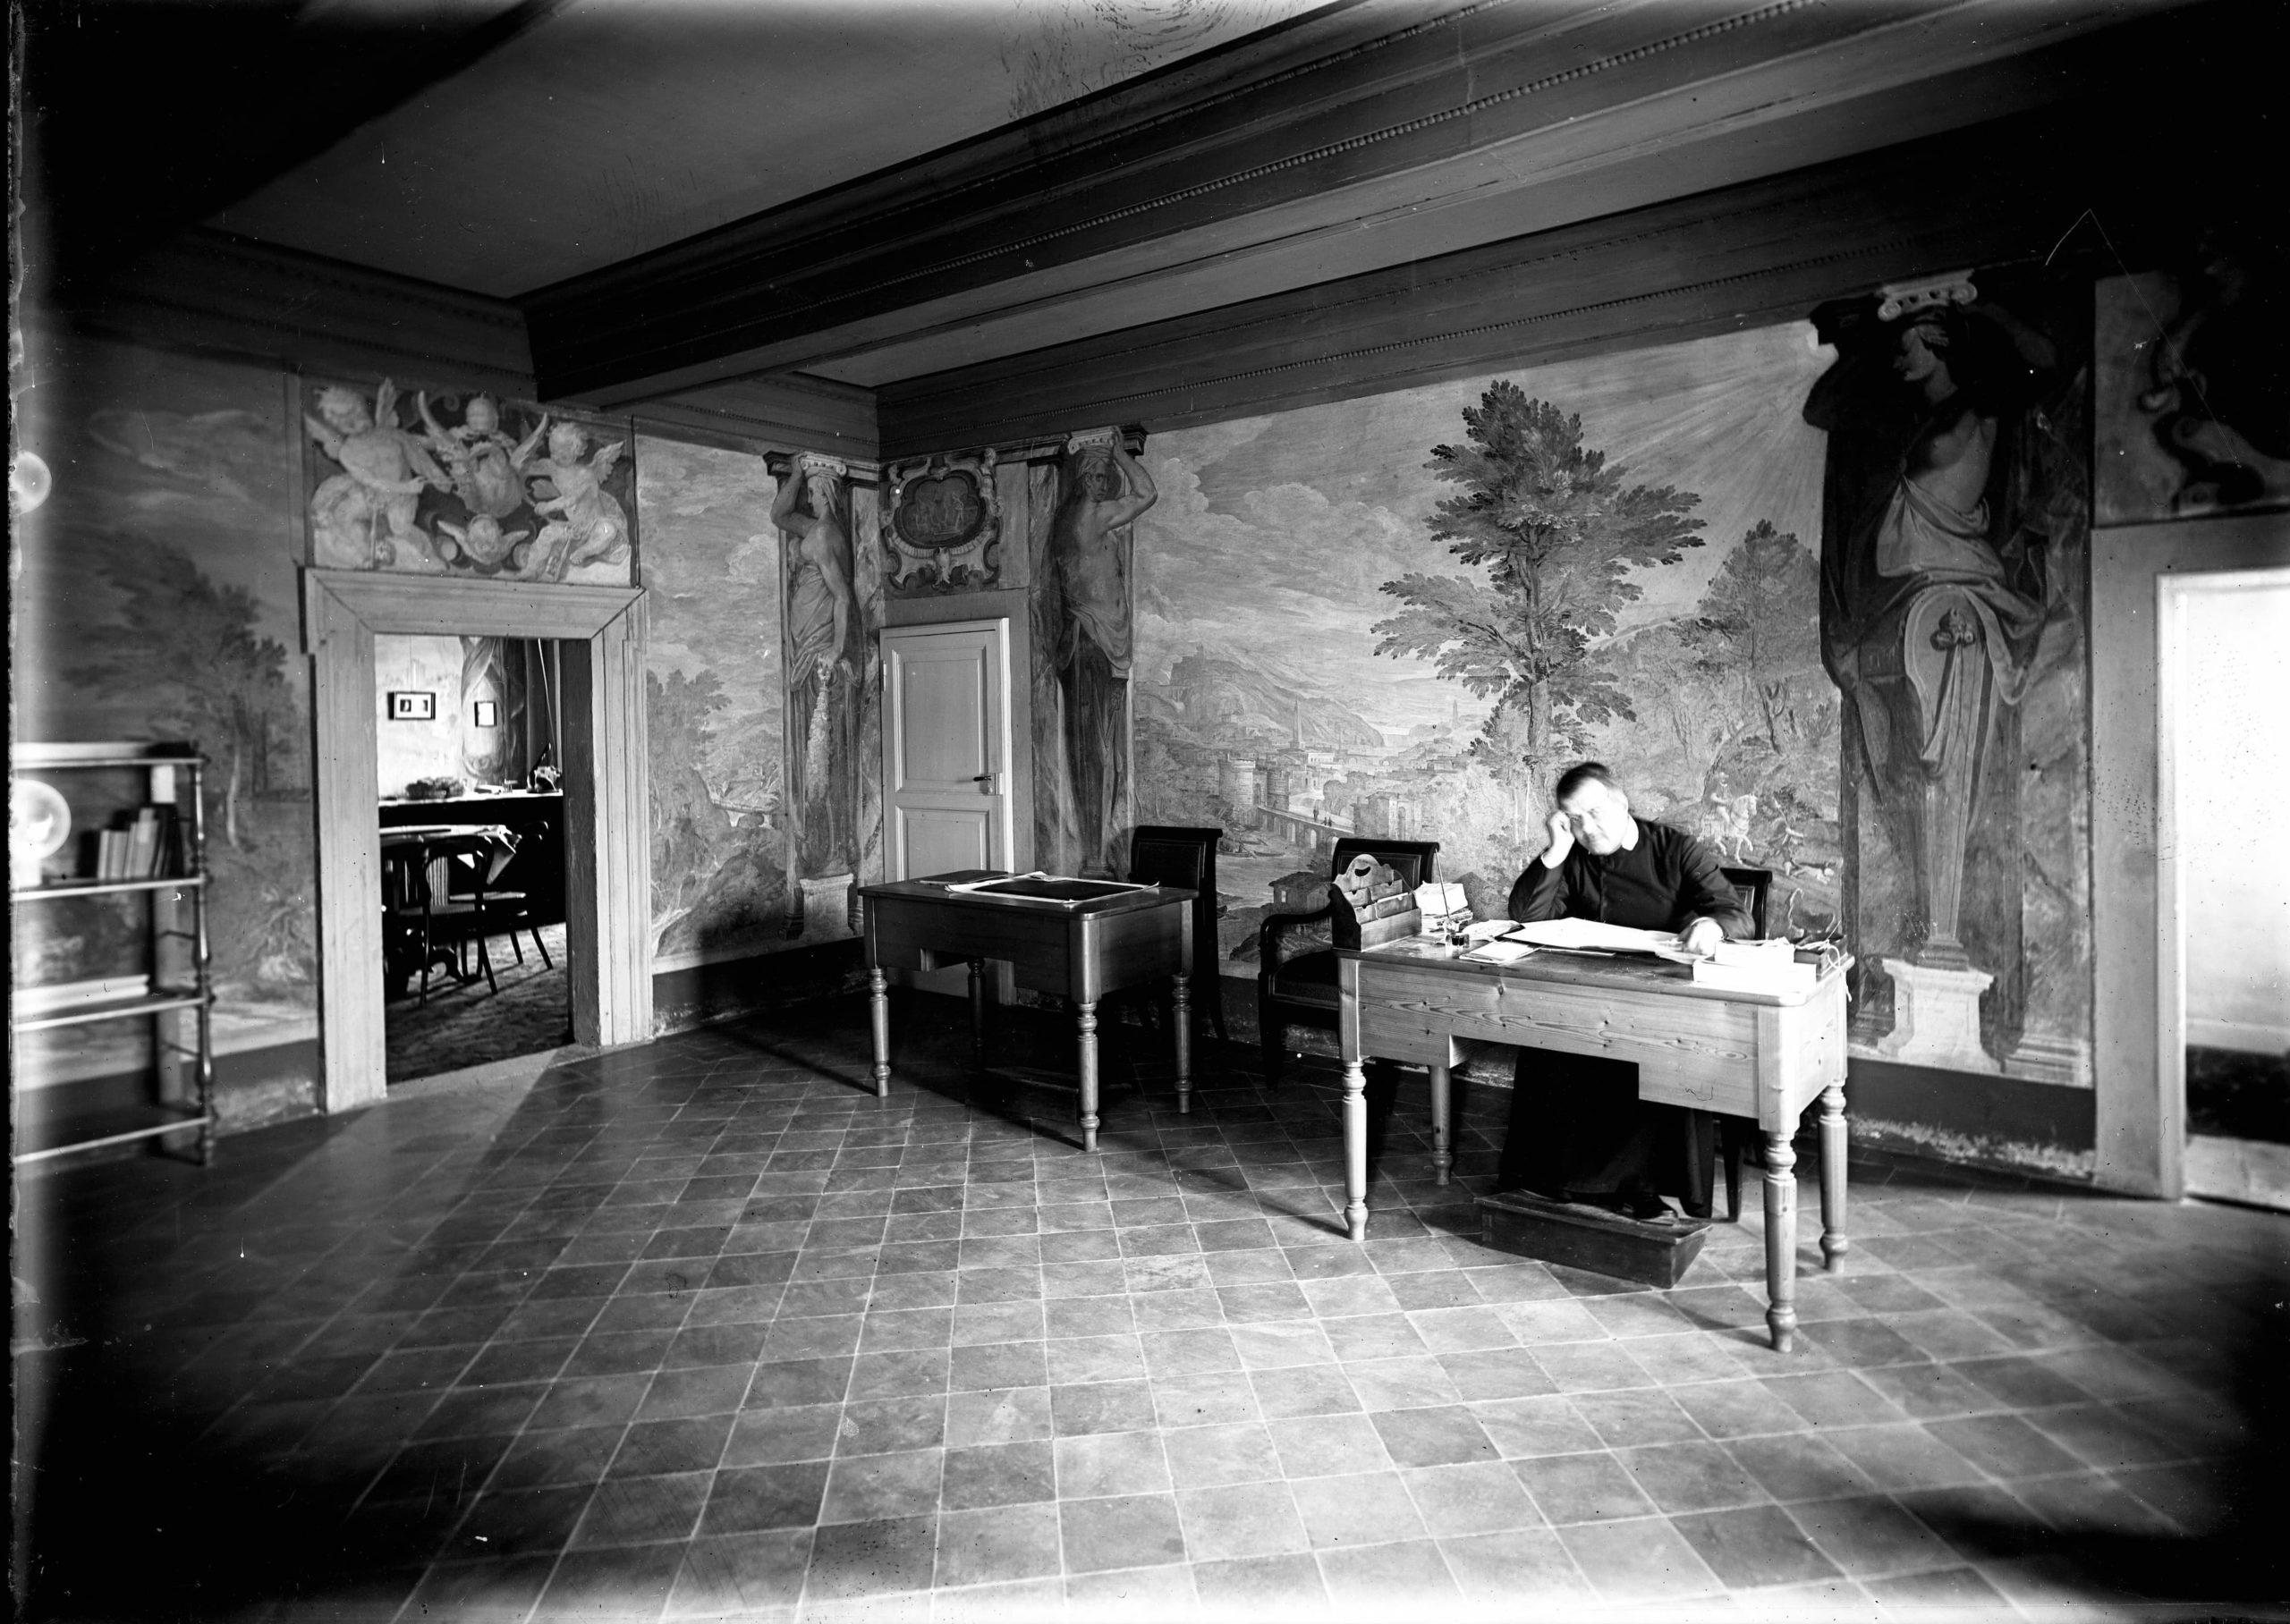 Fr. Lais in his office, circa 1900